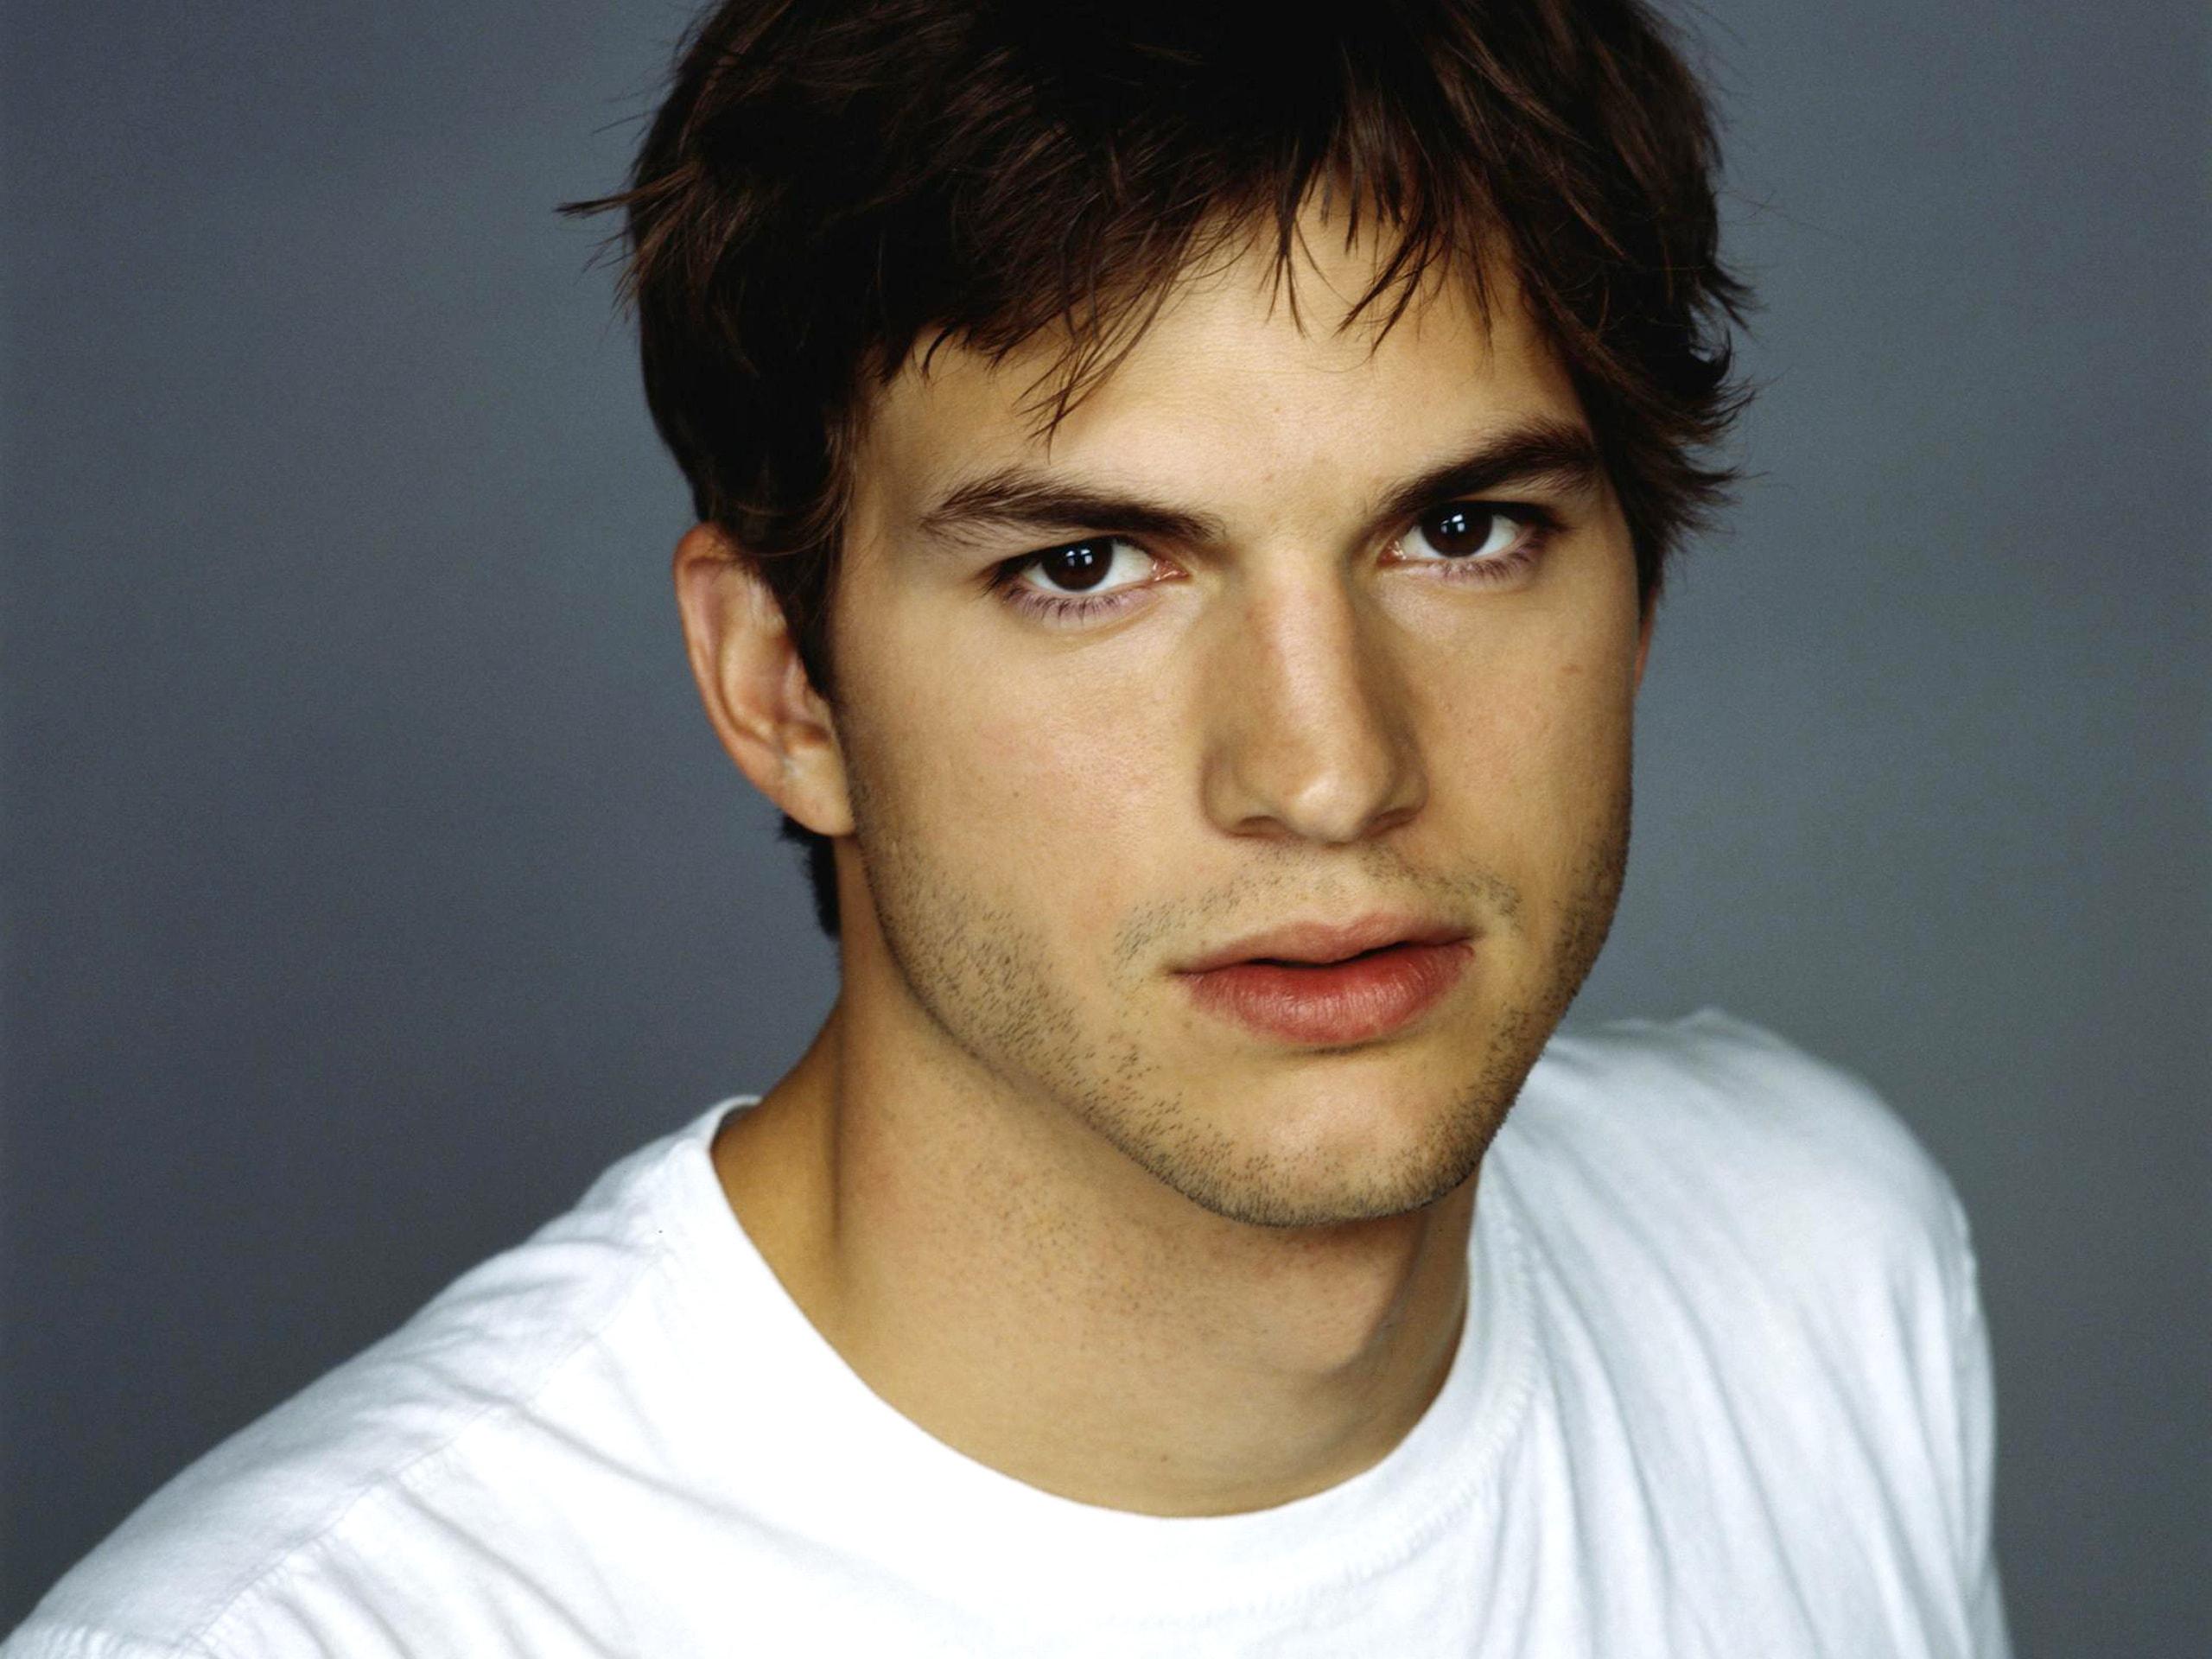 Ashton Kutcher HD Wallpapers 7wallpapersnet 2560x1920